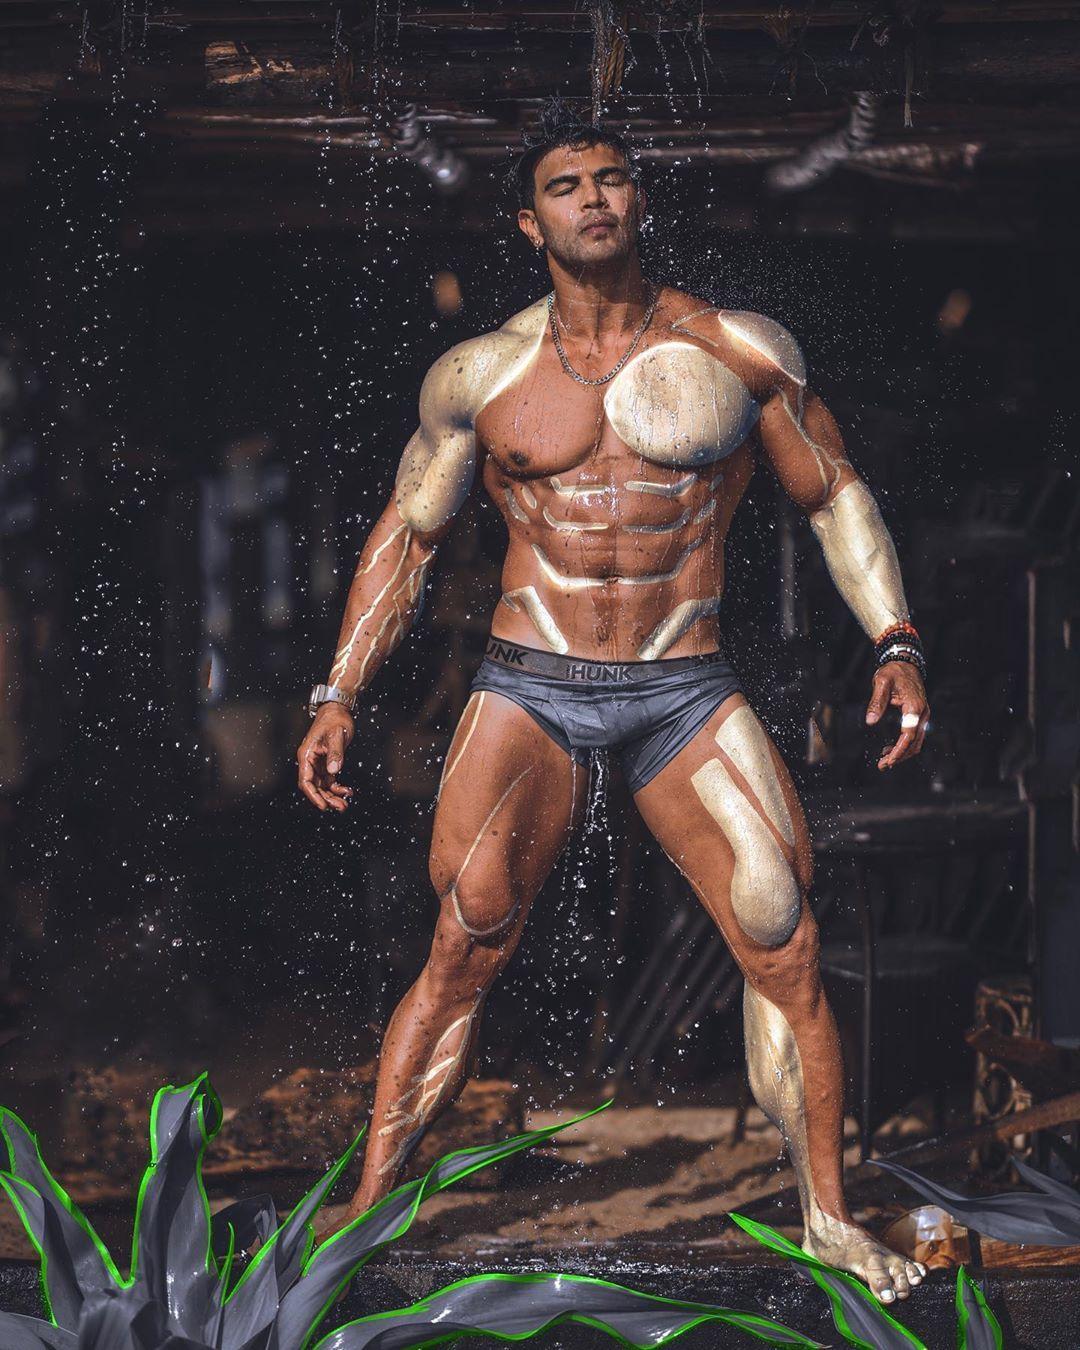 Sahil Khan Wife Indian Bodybuilder Fitness Daily Workout Sahil khan, sahil karimkhan, s khan, sahilk khan. sahil khan wife indian bodybuilder